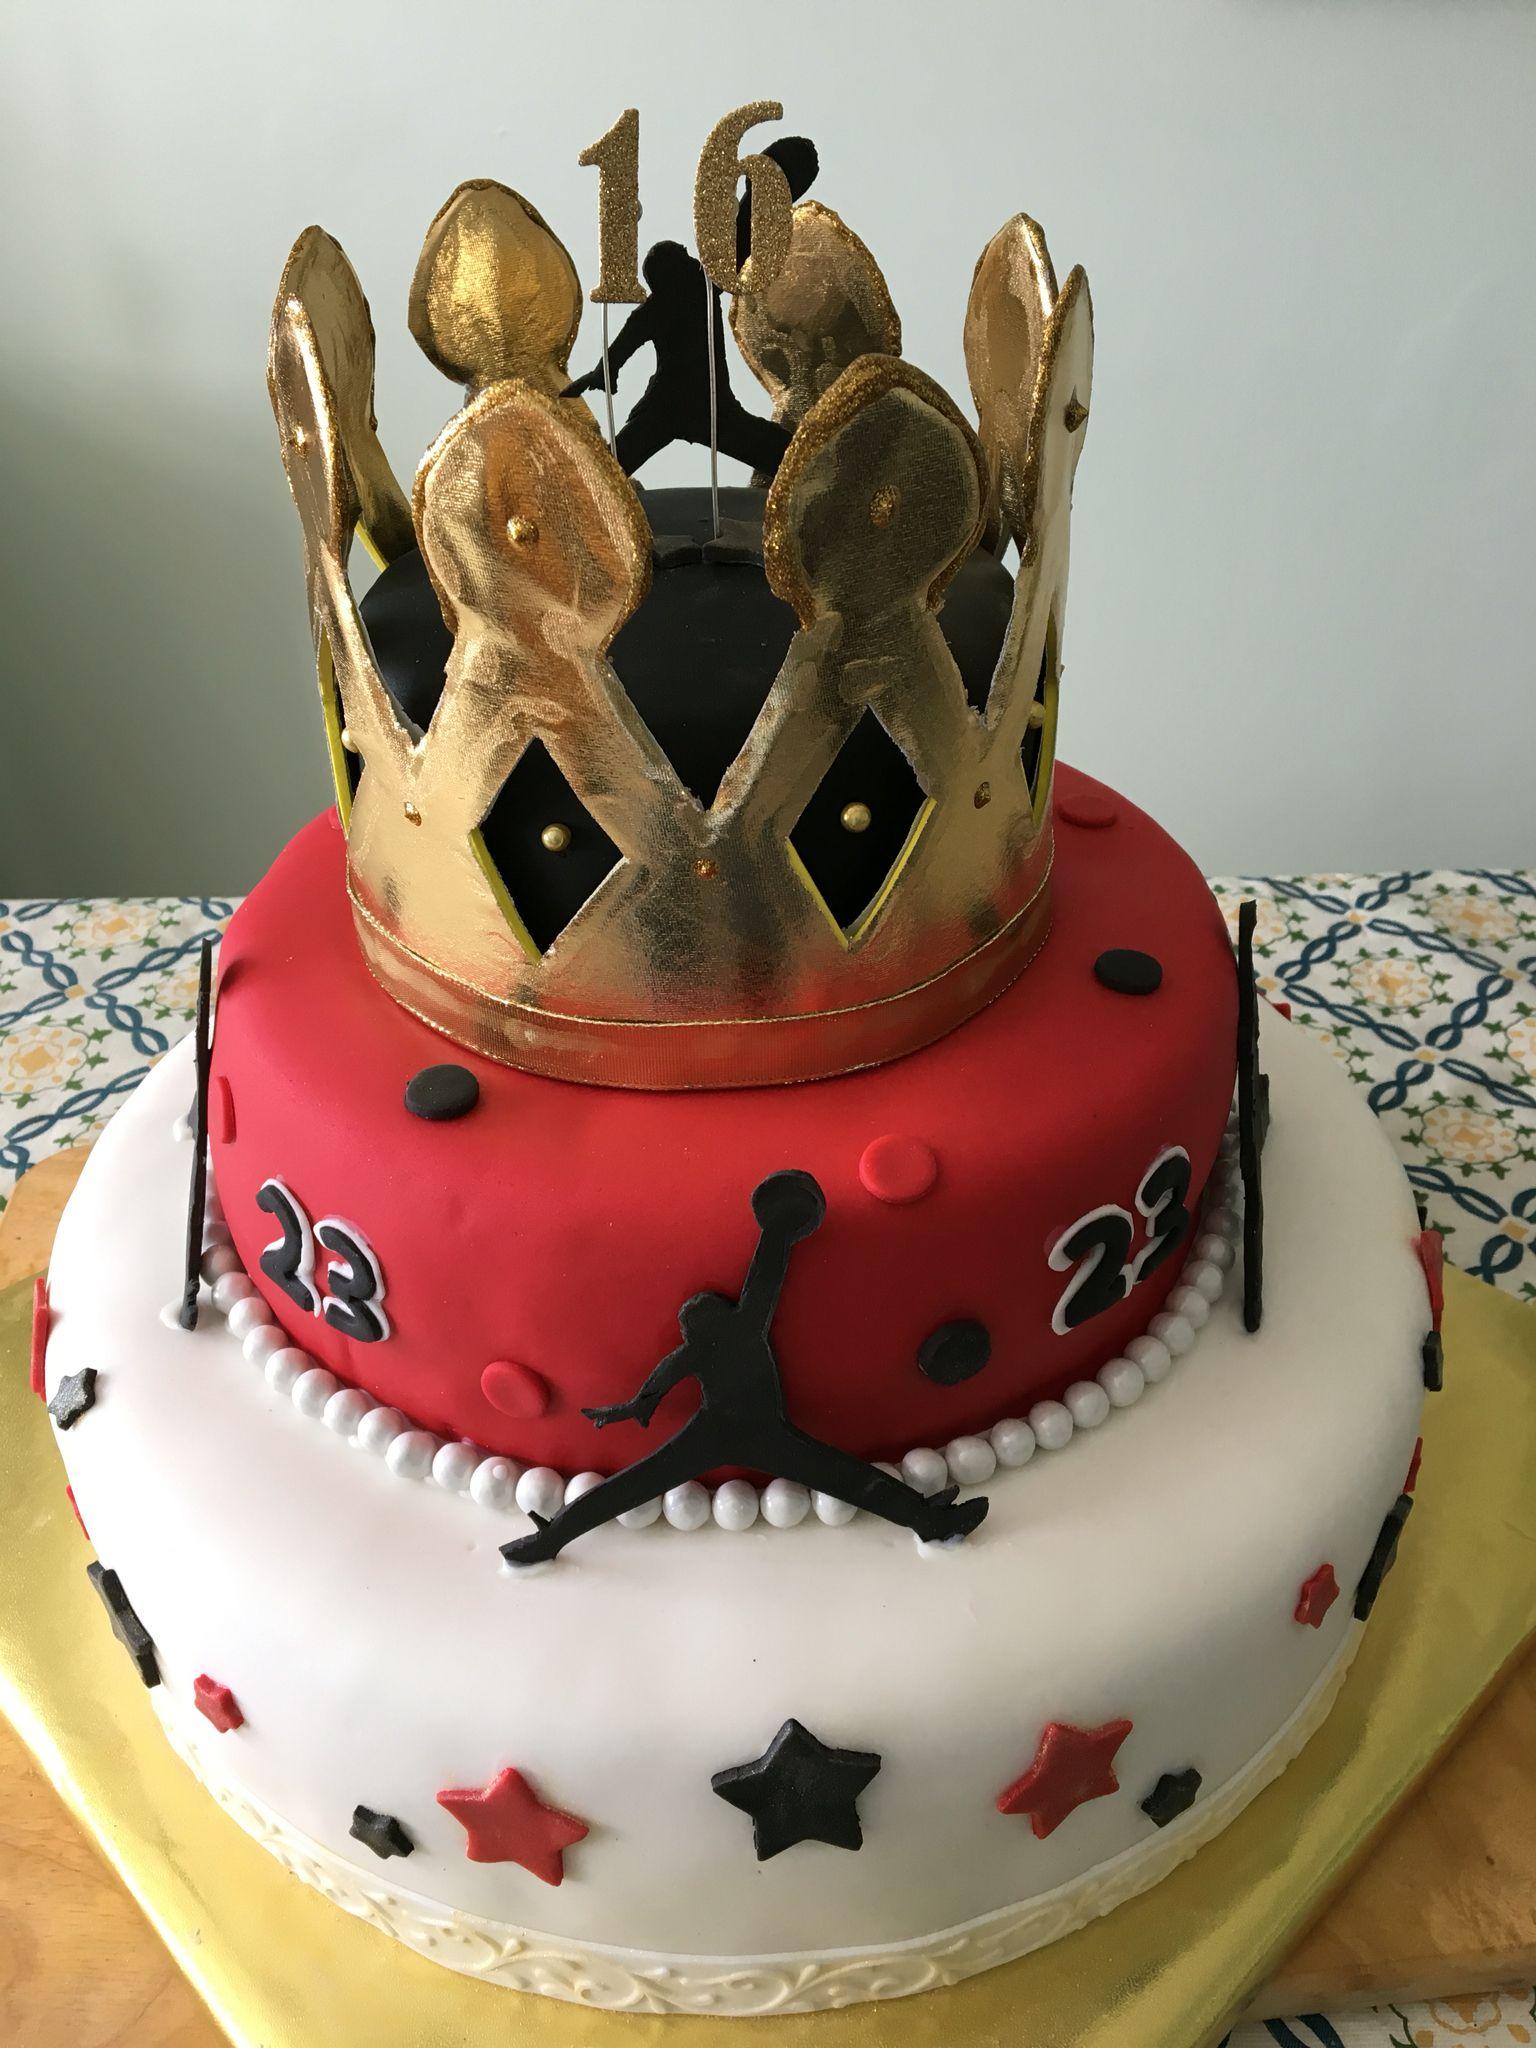 Strange Michael Jordan Themed Crown Cake For 16 Year Old Boy Crown Cake Personalised Birthday Cards Paralily Jamesorg